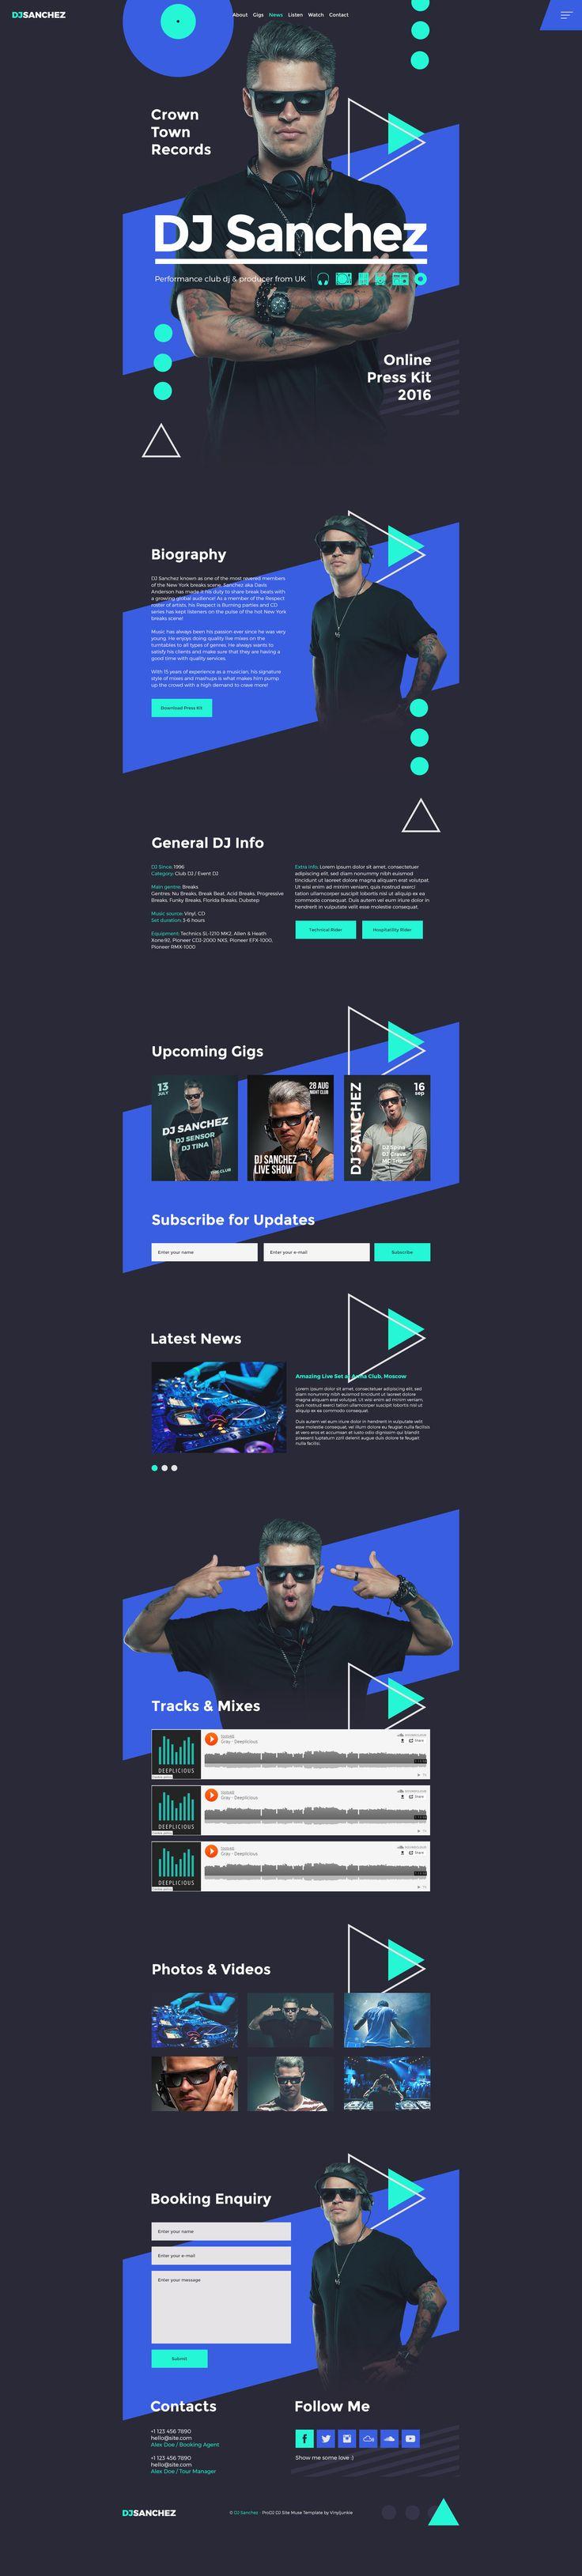 best 25 dj website ideas on pinterest